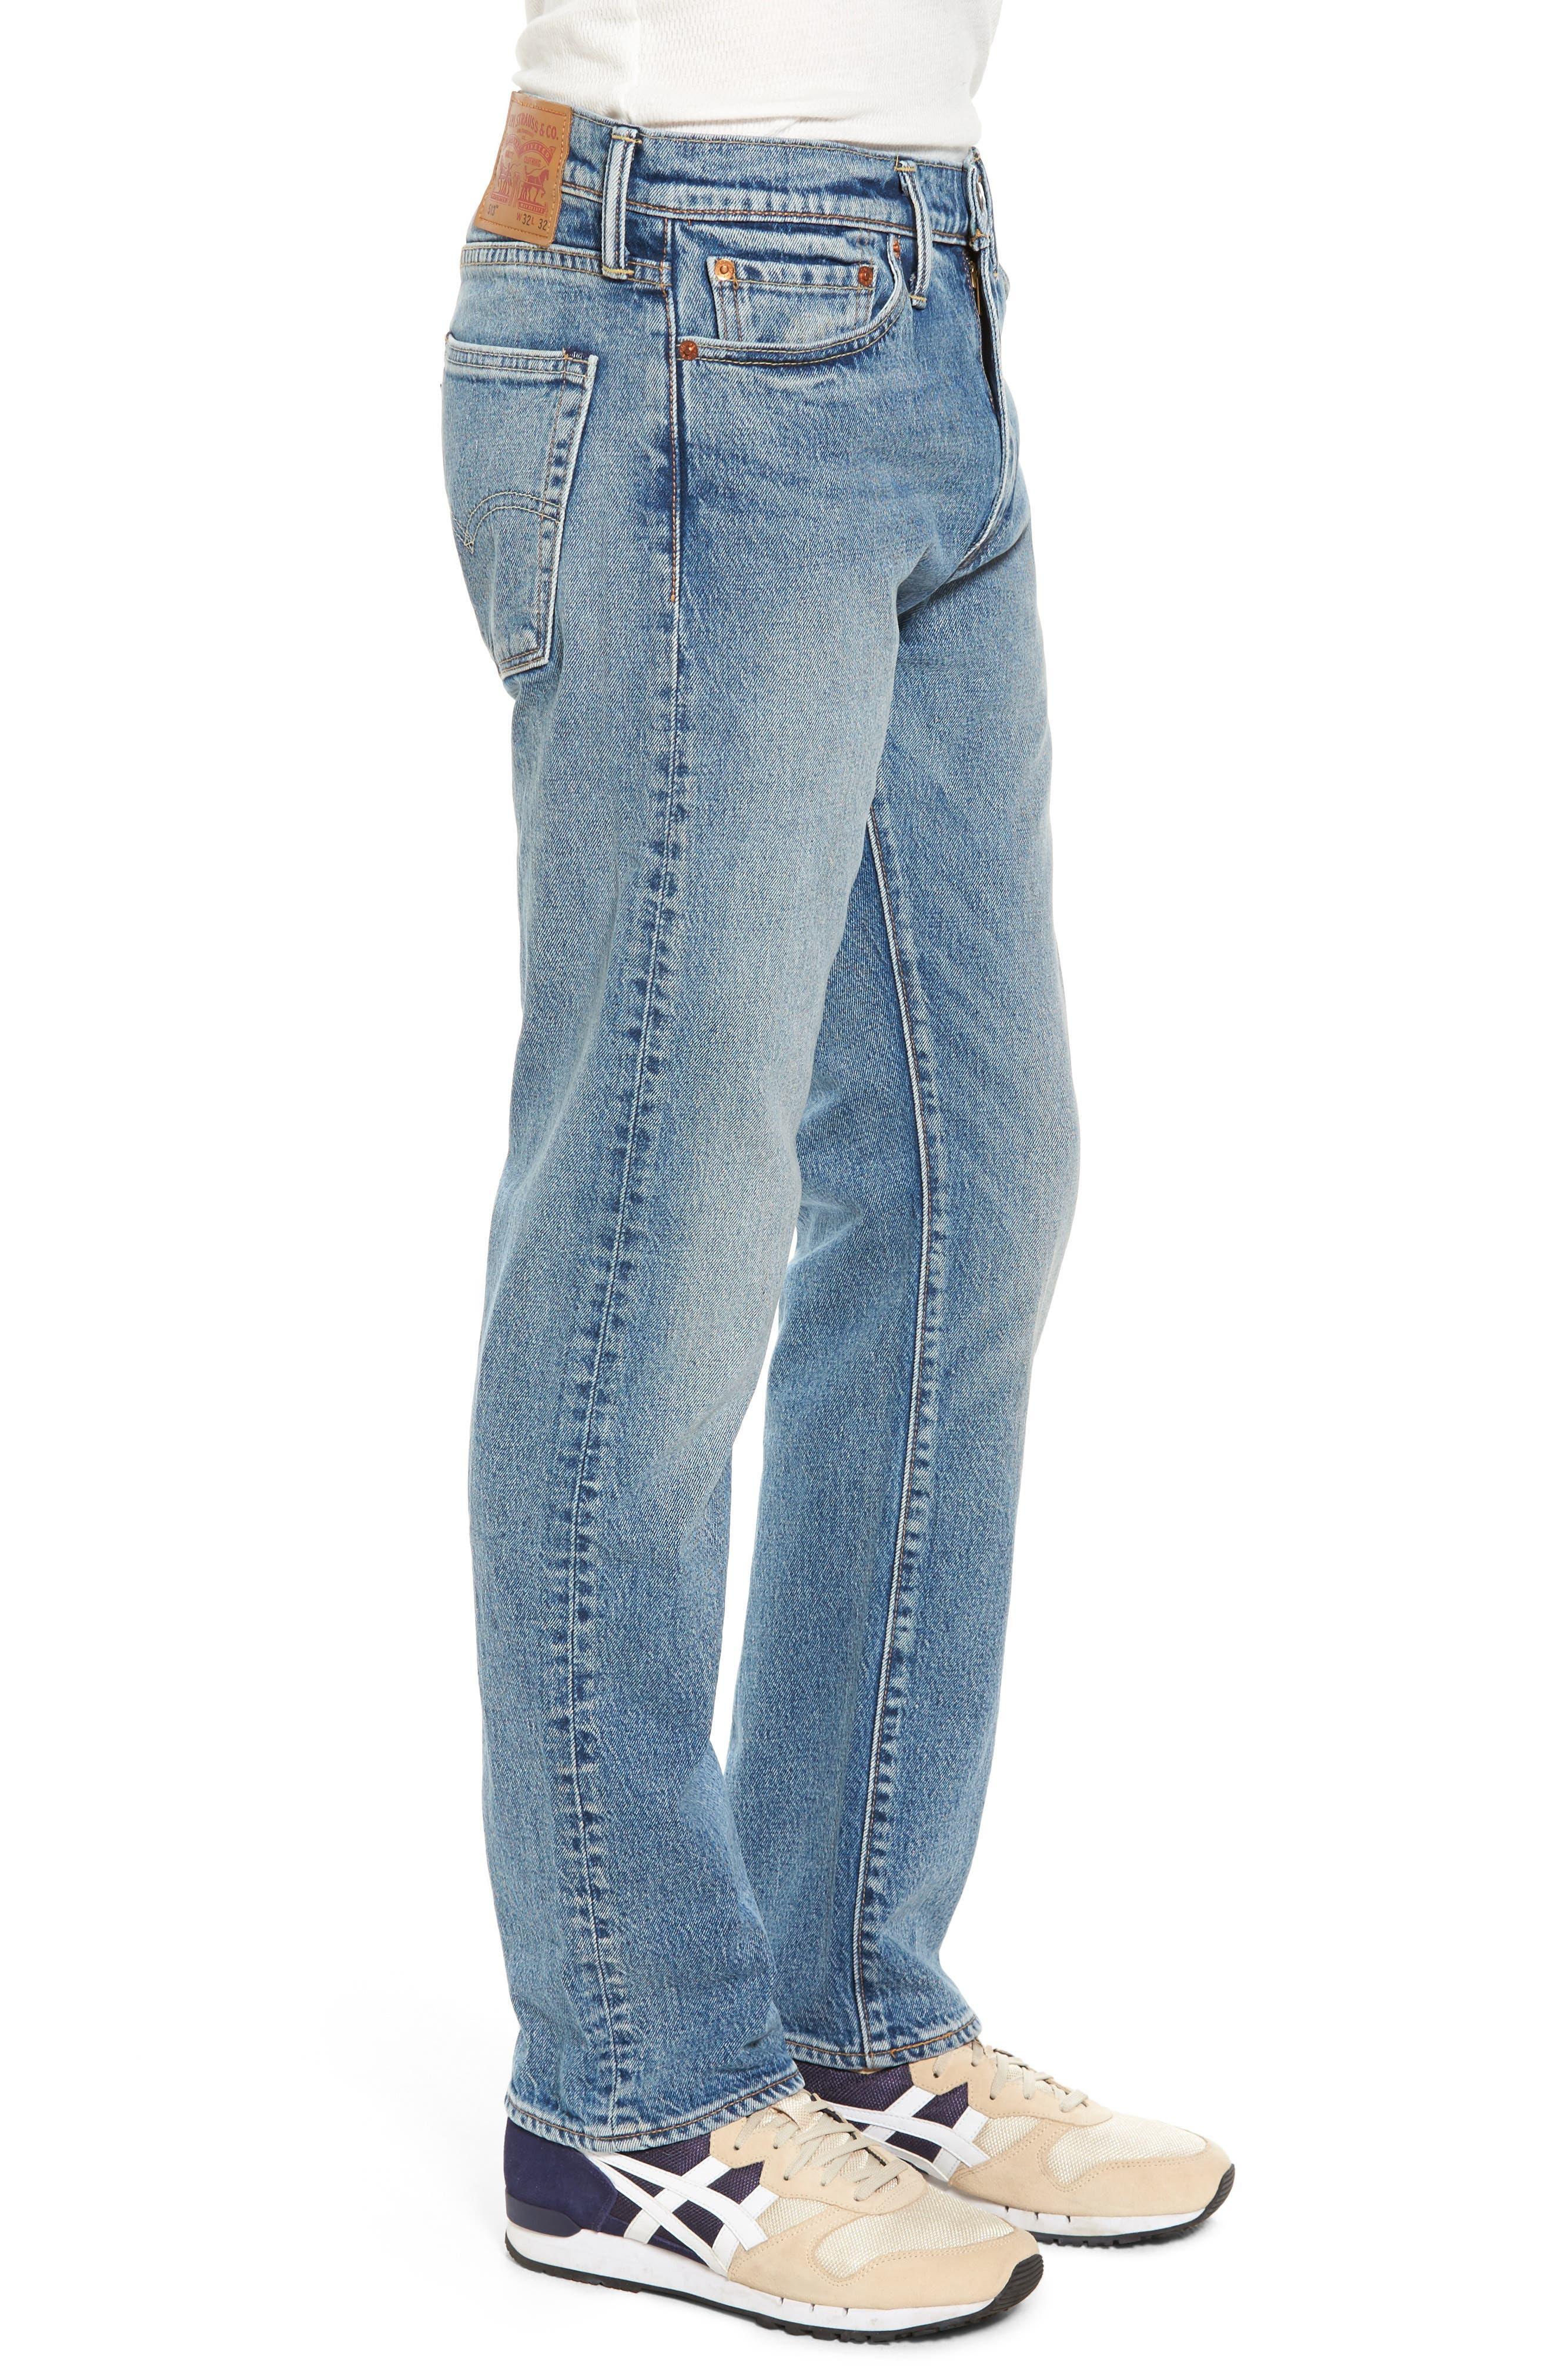 Alternate Image 3  - Levi's® 513™ Slim Straight Leg Jeans (Light Blue Rolf)